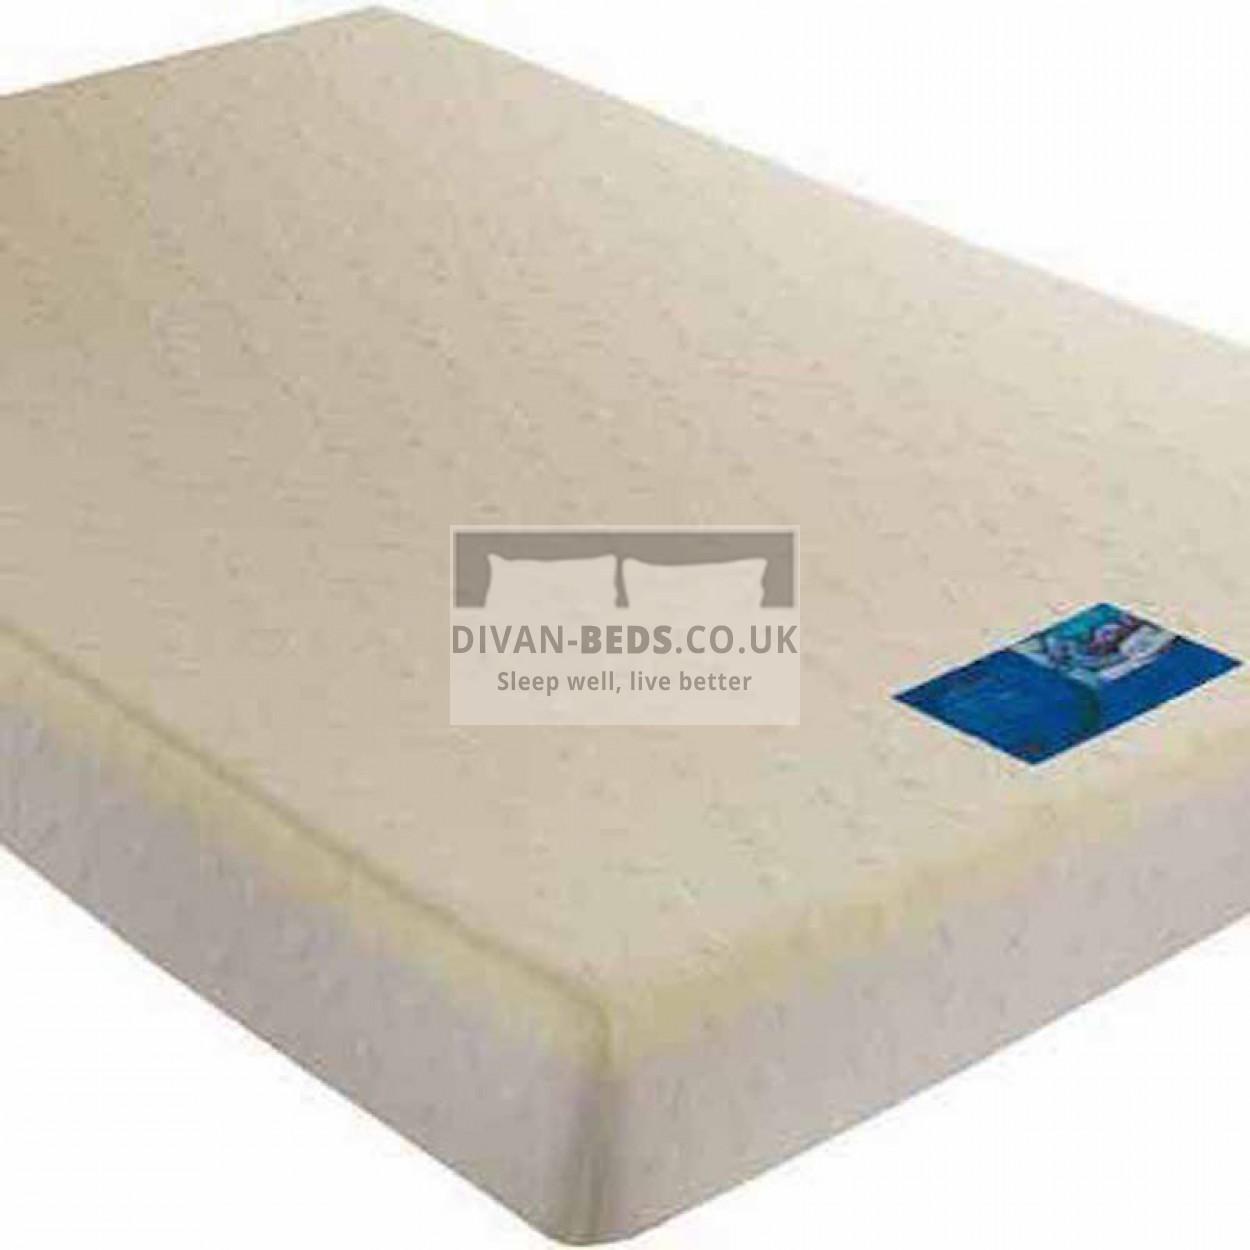 Orthopaedic Reflex Foam Mattress Guaranteed Cheapest